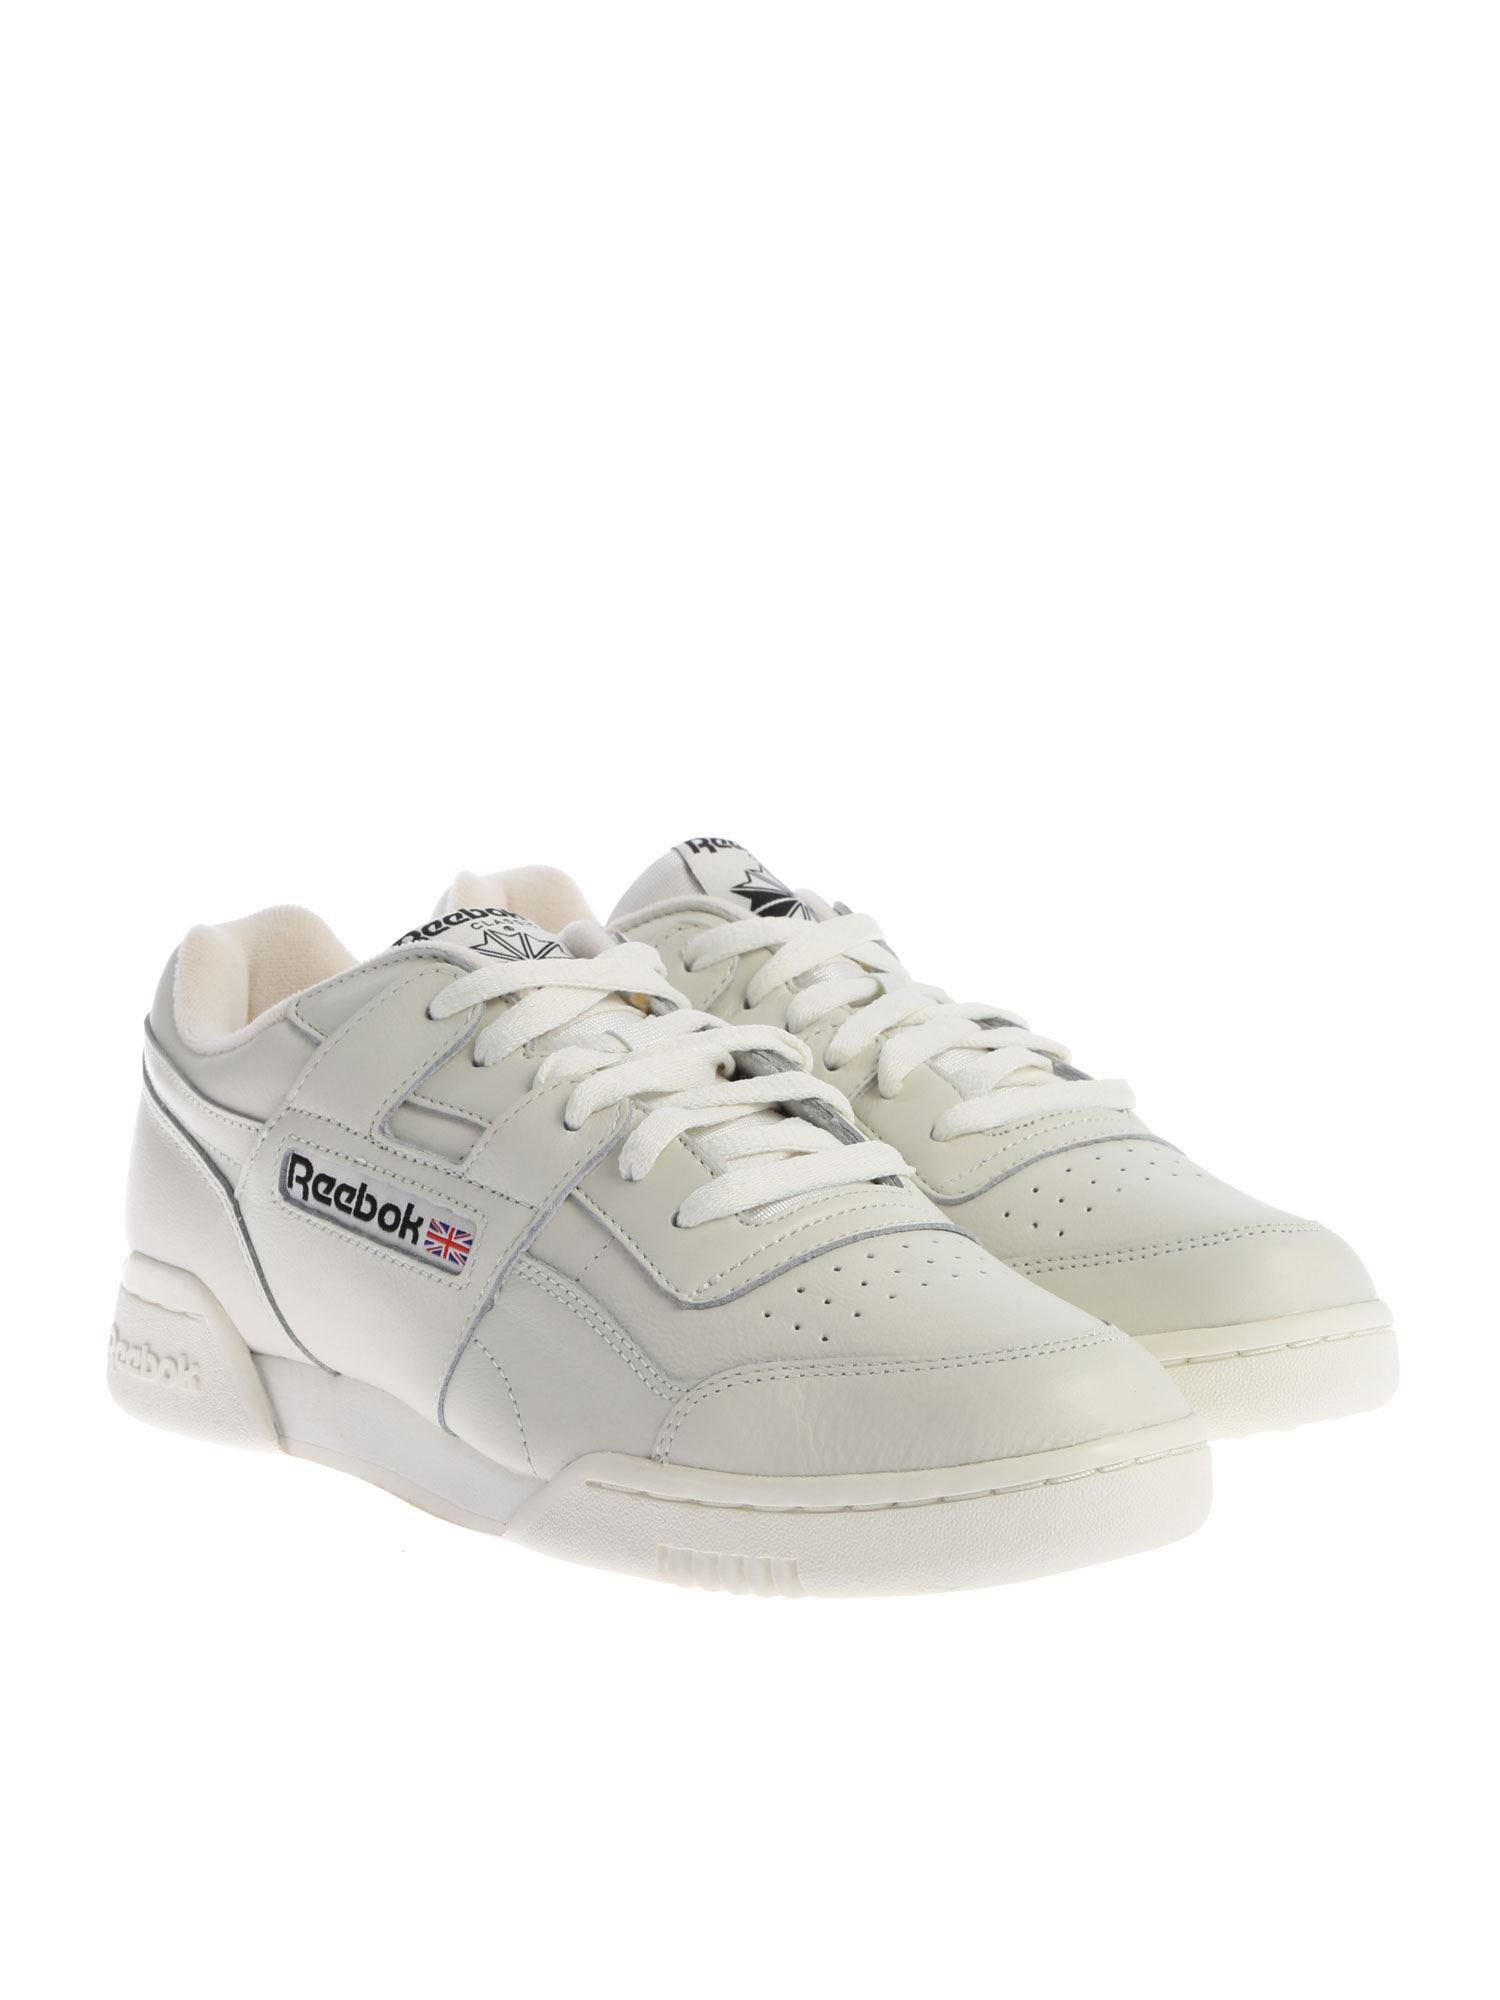 Lyst - Reebok Cream-colored